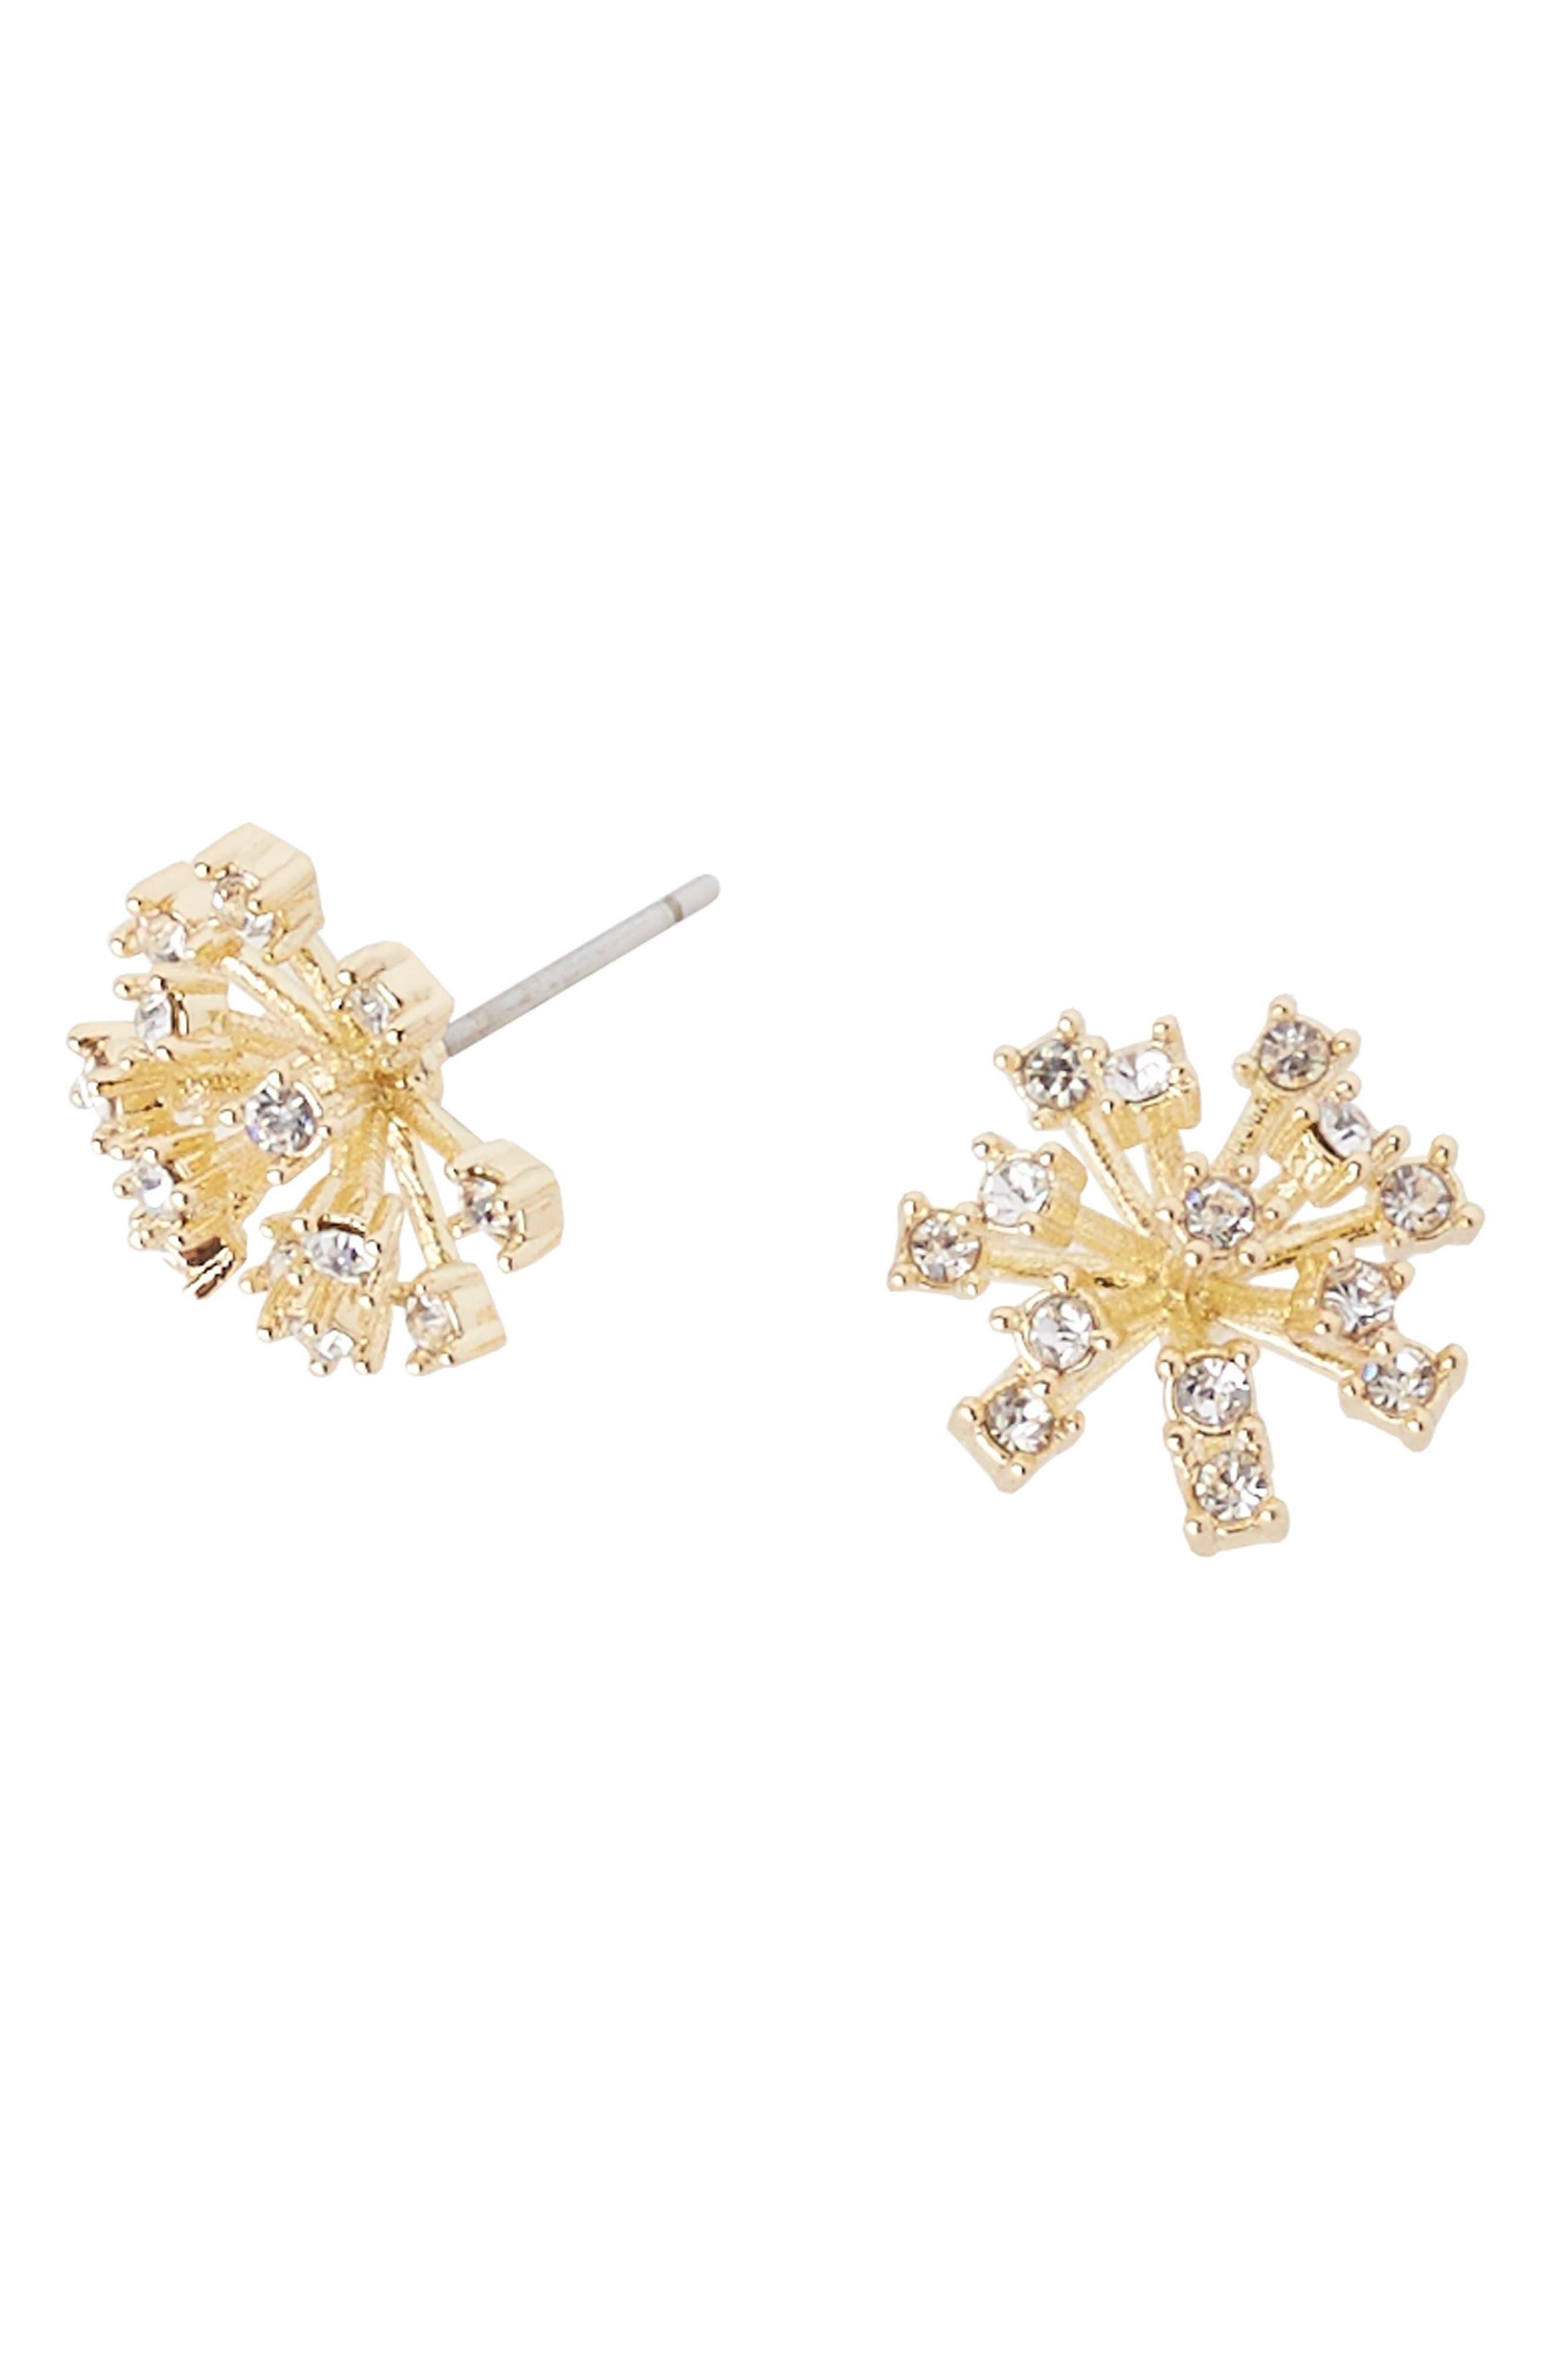 Lilly Pulitzer® Fiesta Crystal Stud Earrings